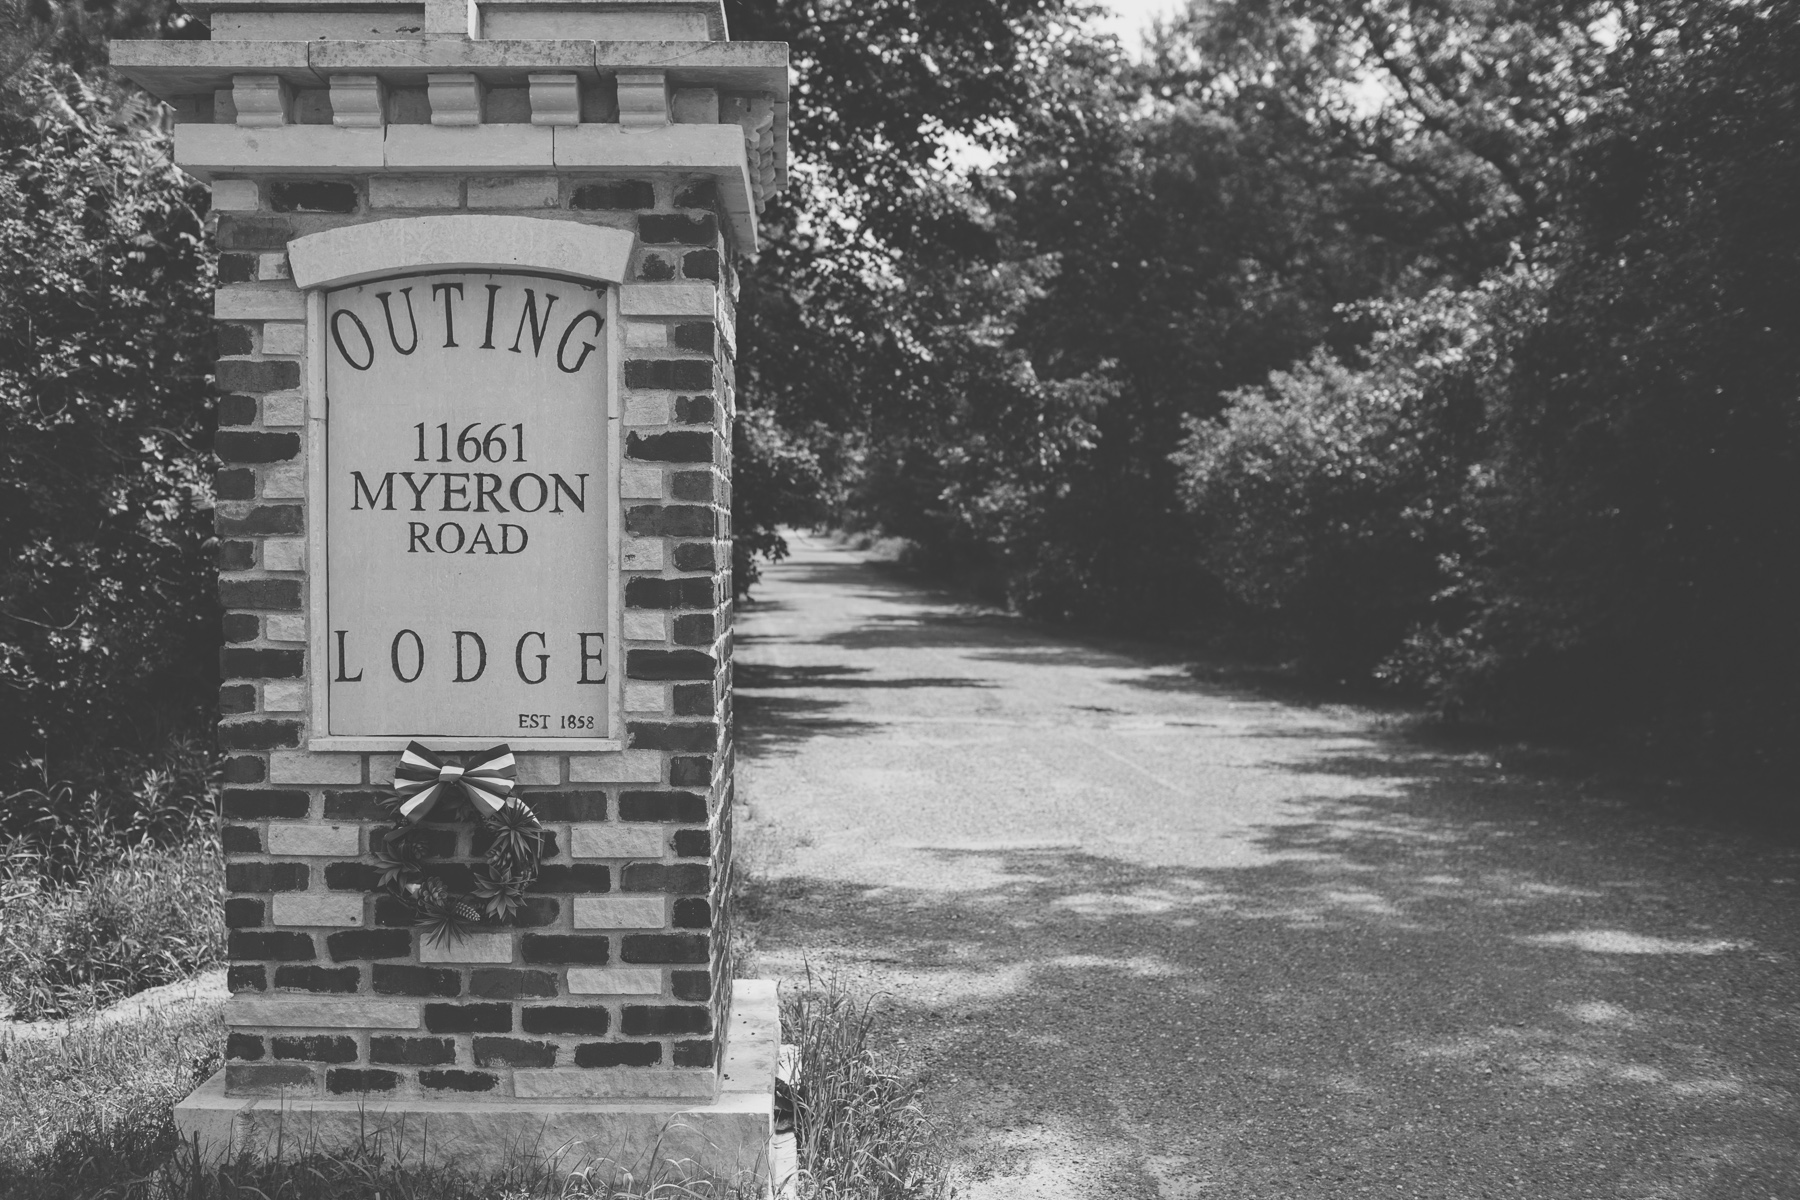 Lydia_Nihart_At_The_Outing_Lodge_Stillwater_Minnesota_By_Photographer_Joe_Lemke_062.JPG